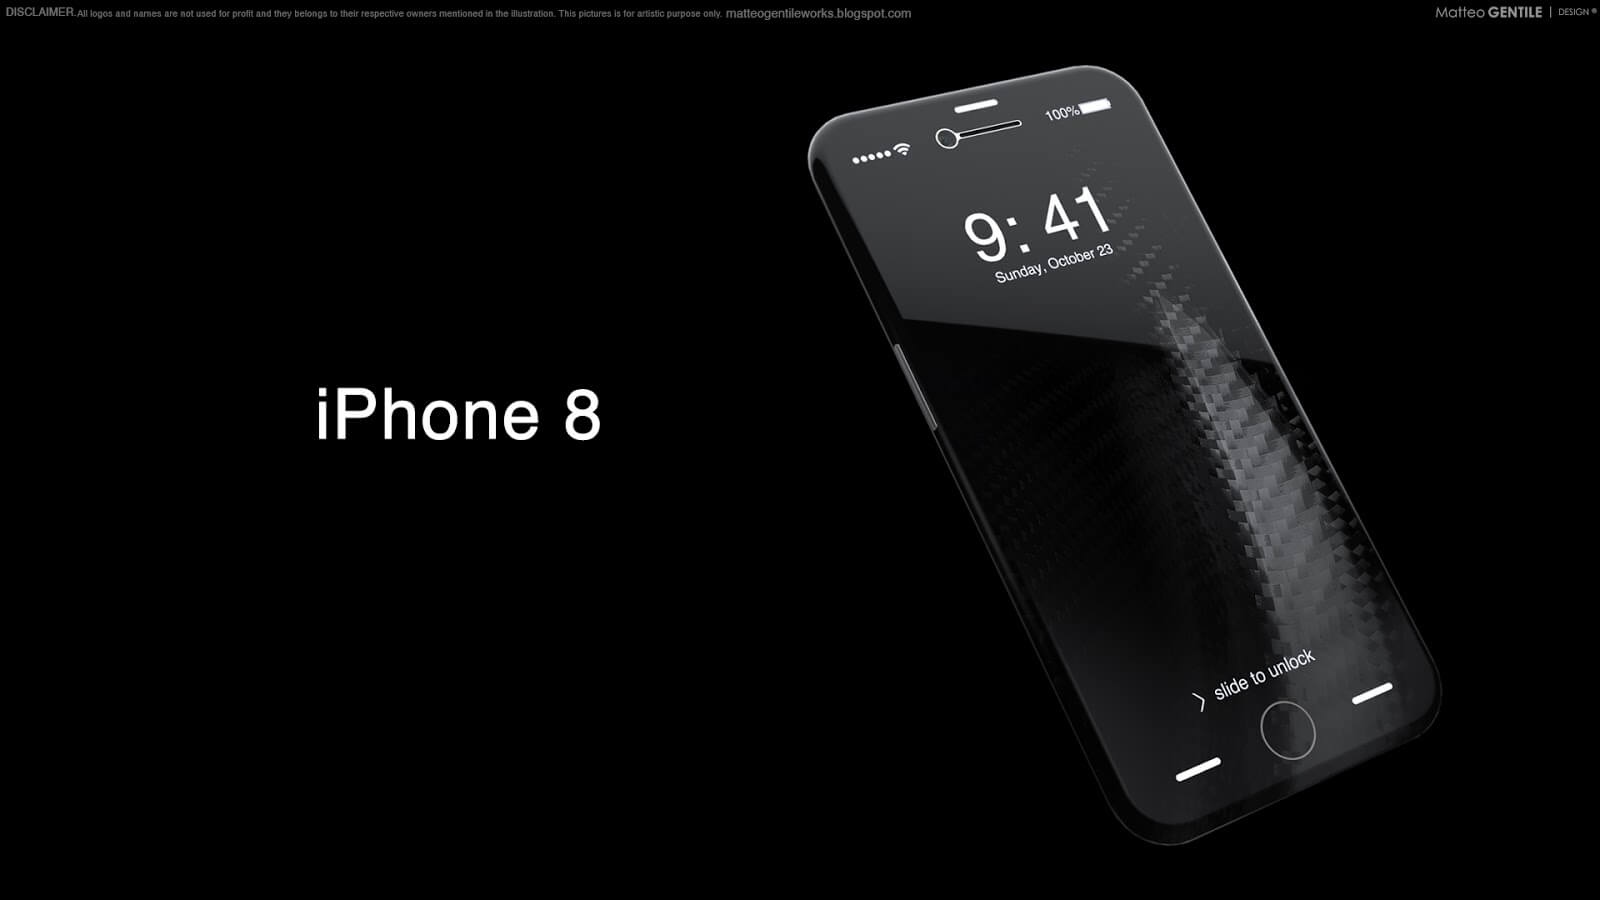 iphone-8-15